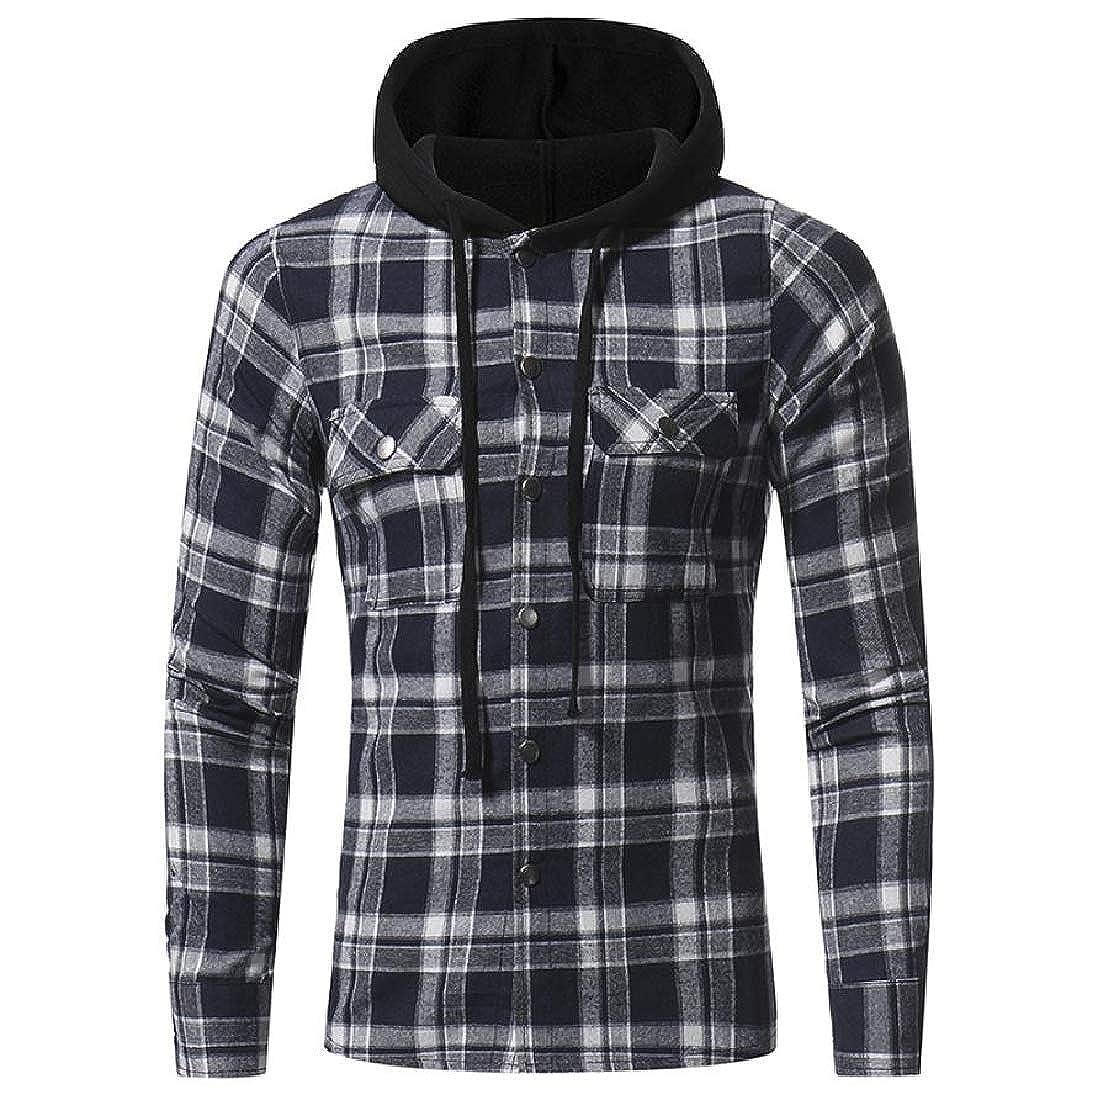 Kankanluck Mens Hooded Button-Down-Shirts Tops Plaid Comfort Shirt